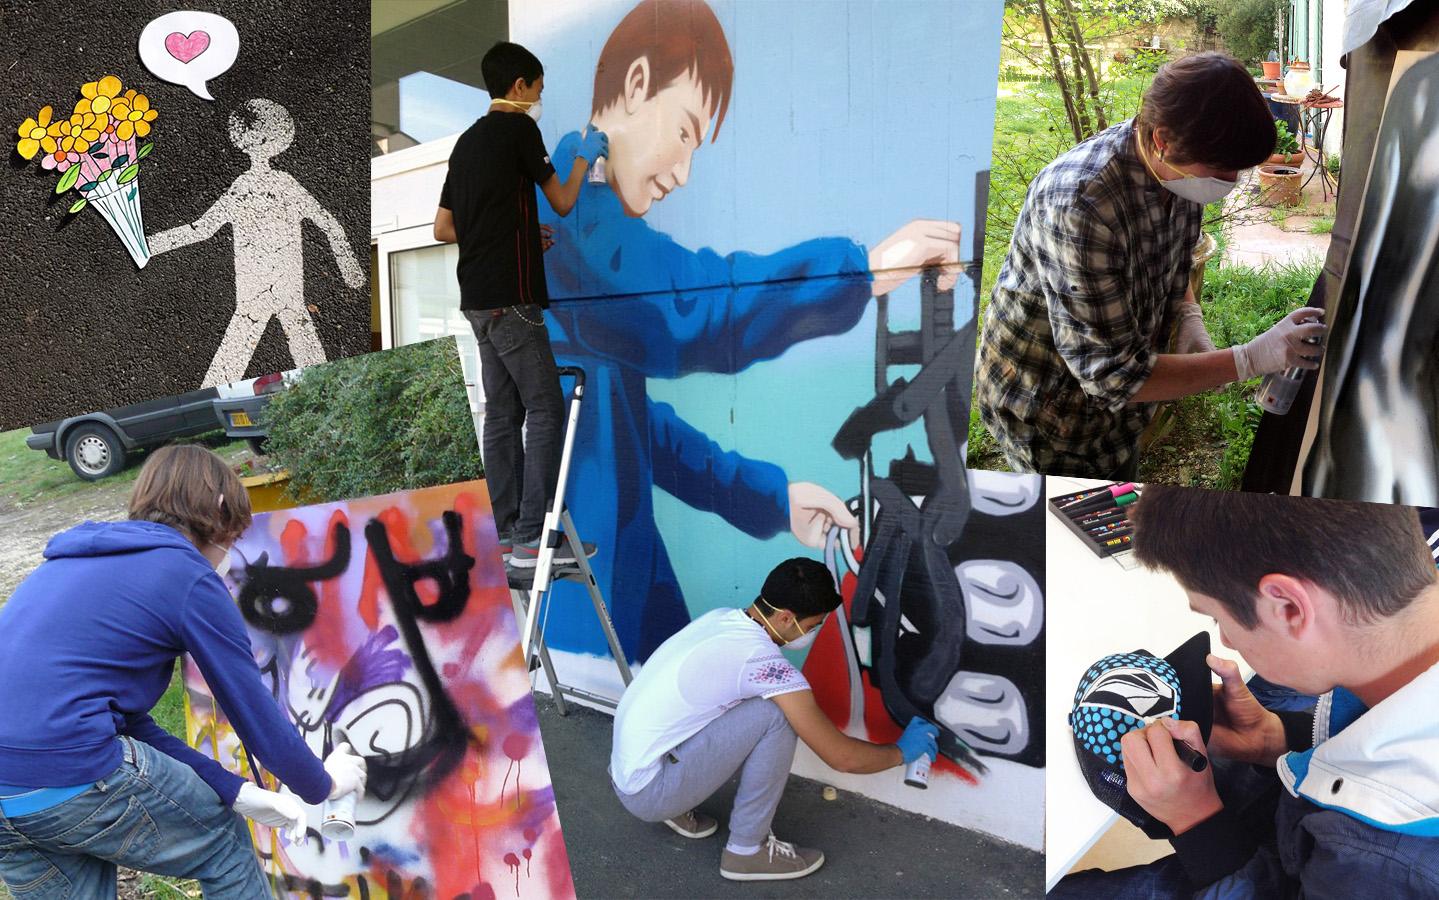 Ateliers-creatifs-initiation-graff-customisation-cours